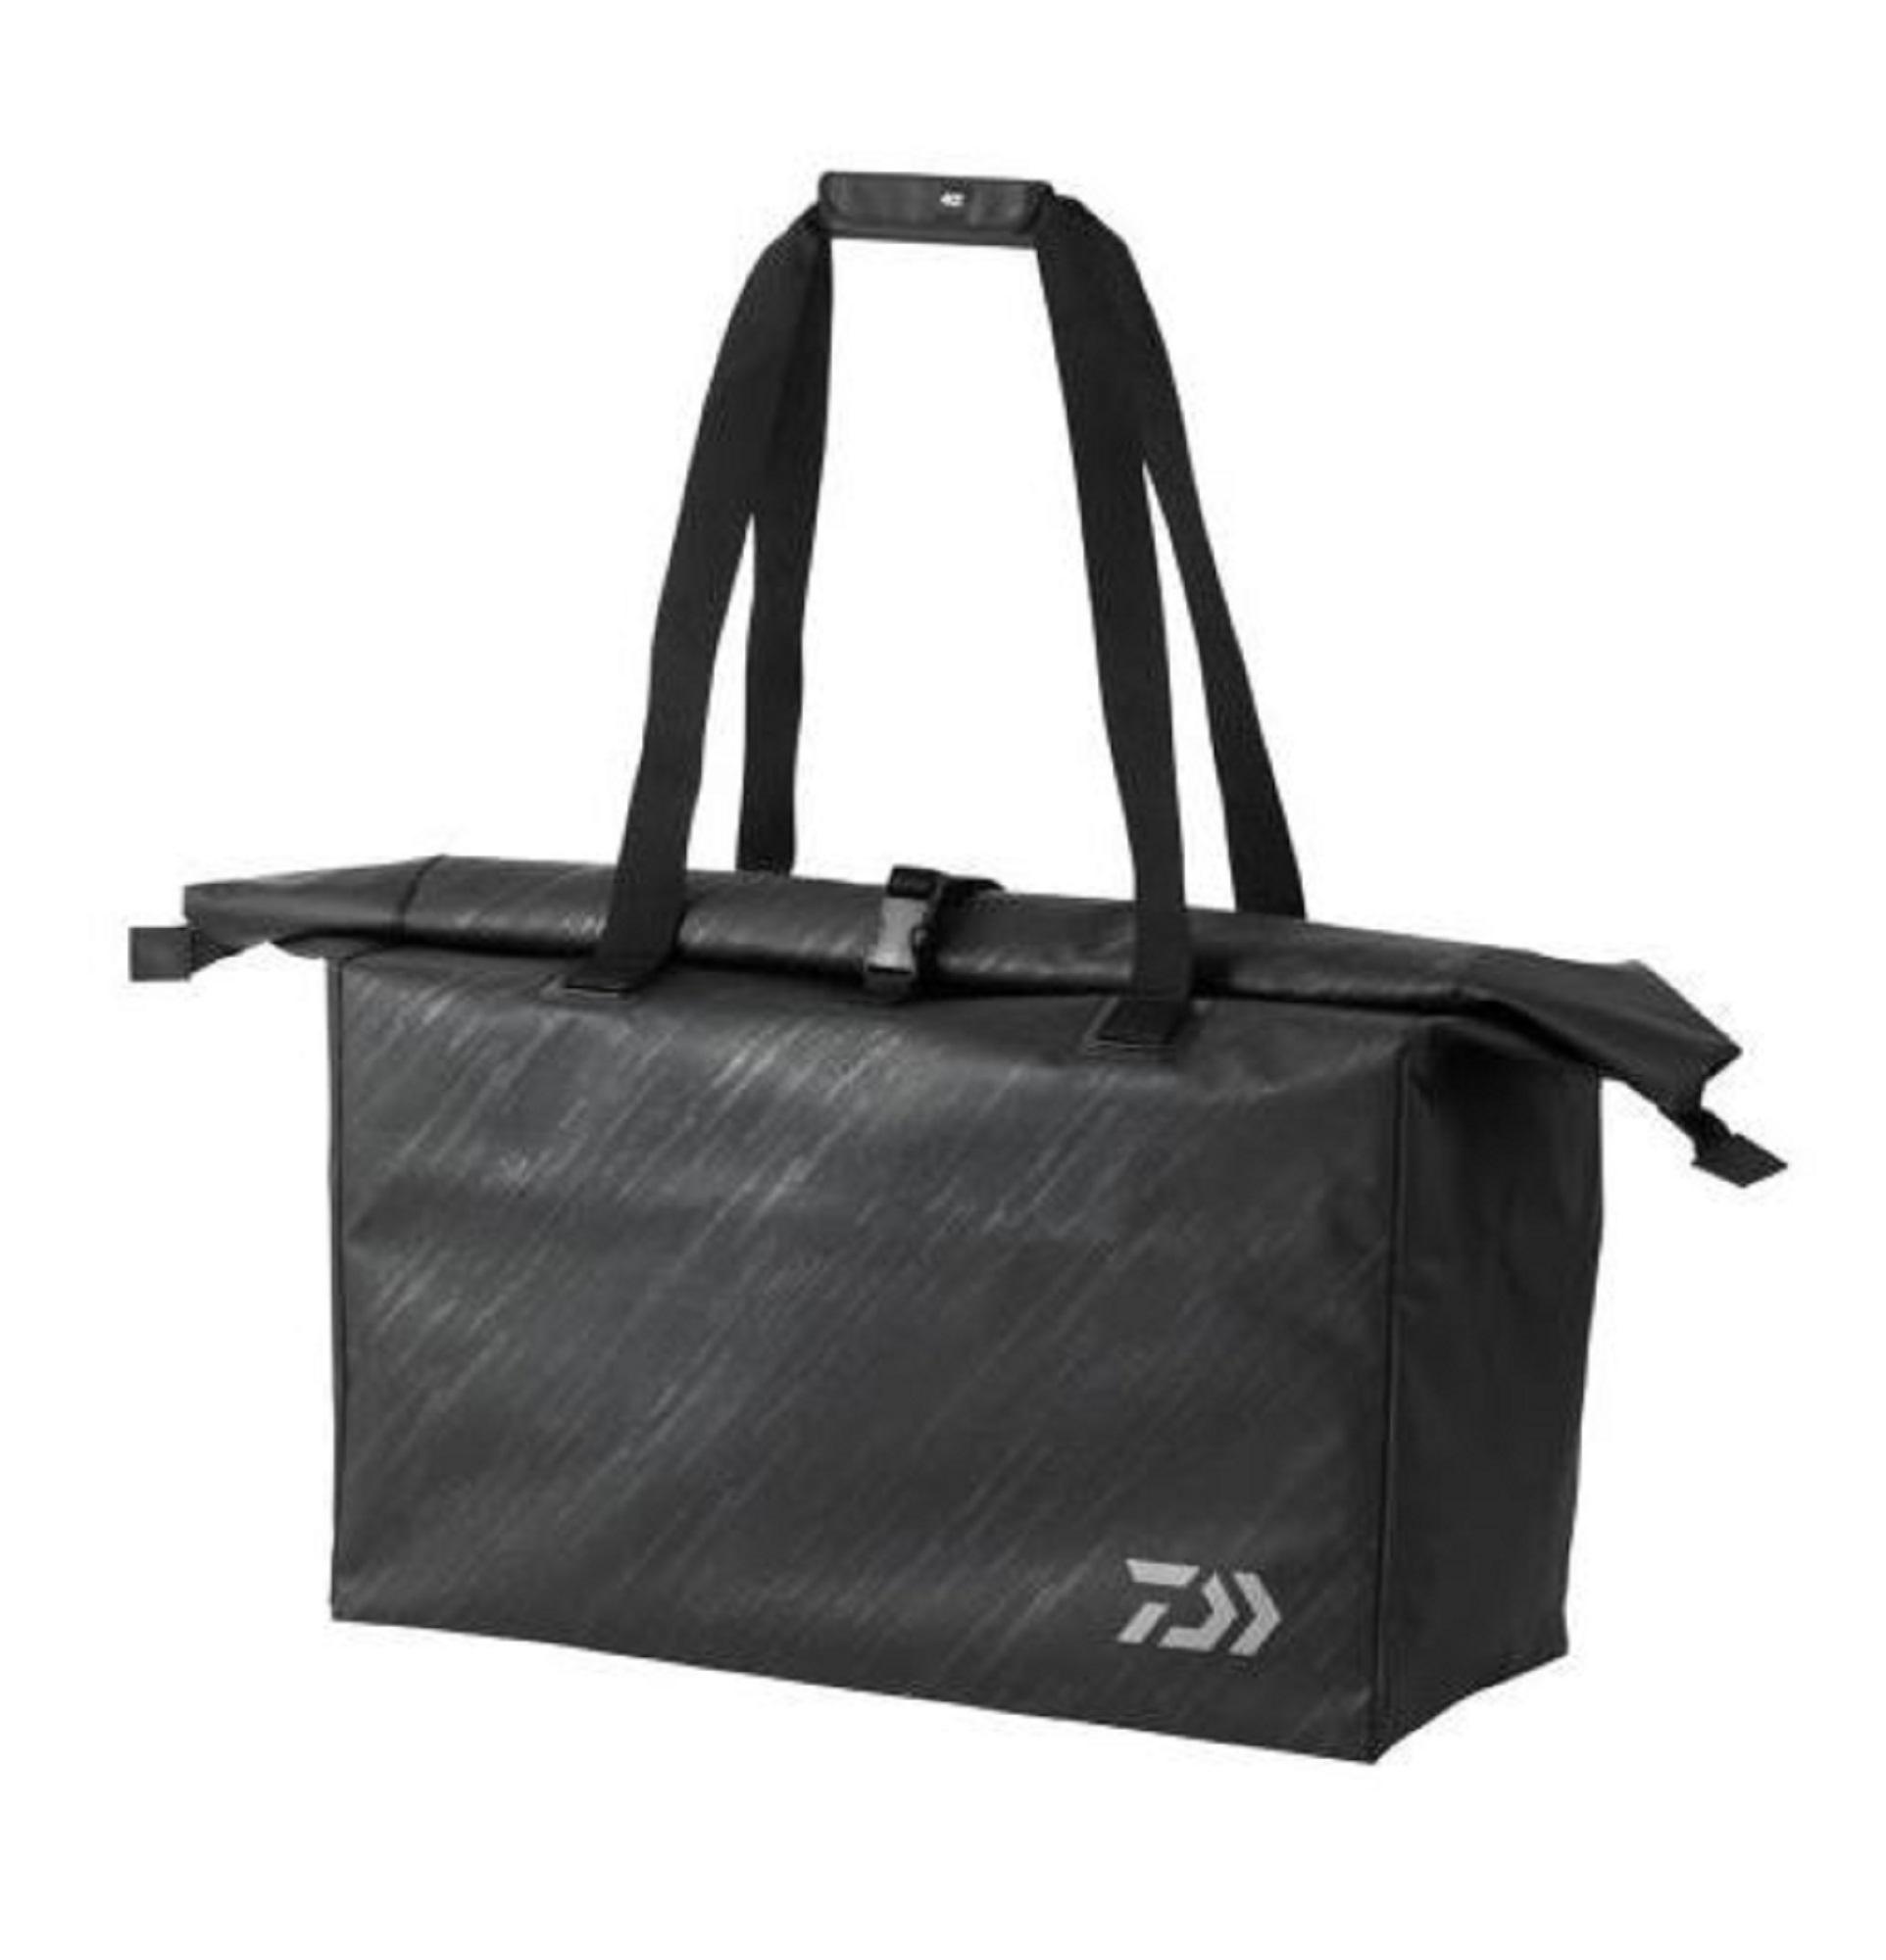 Daiwa Bag Tote TP Black Camo Size L (9491)